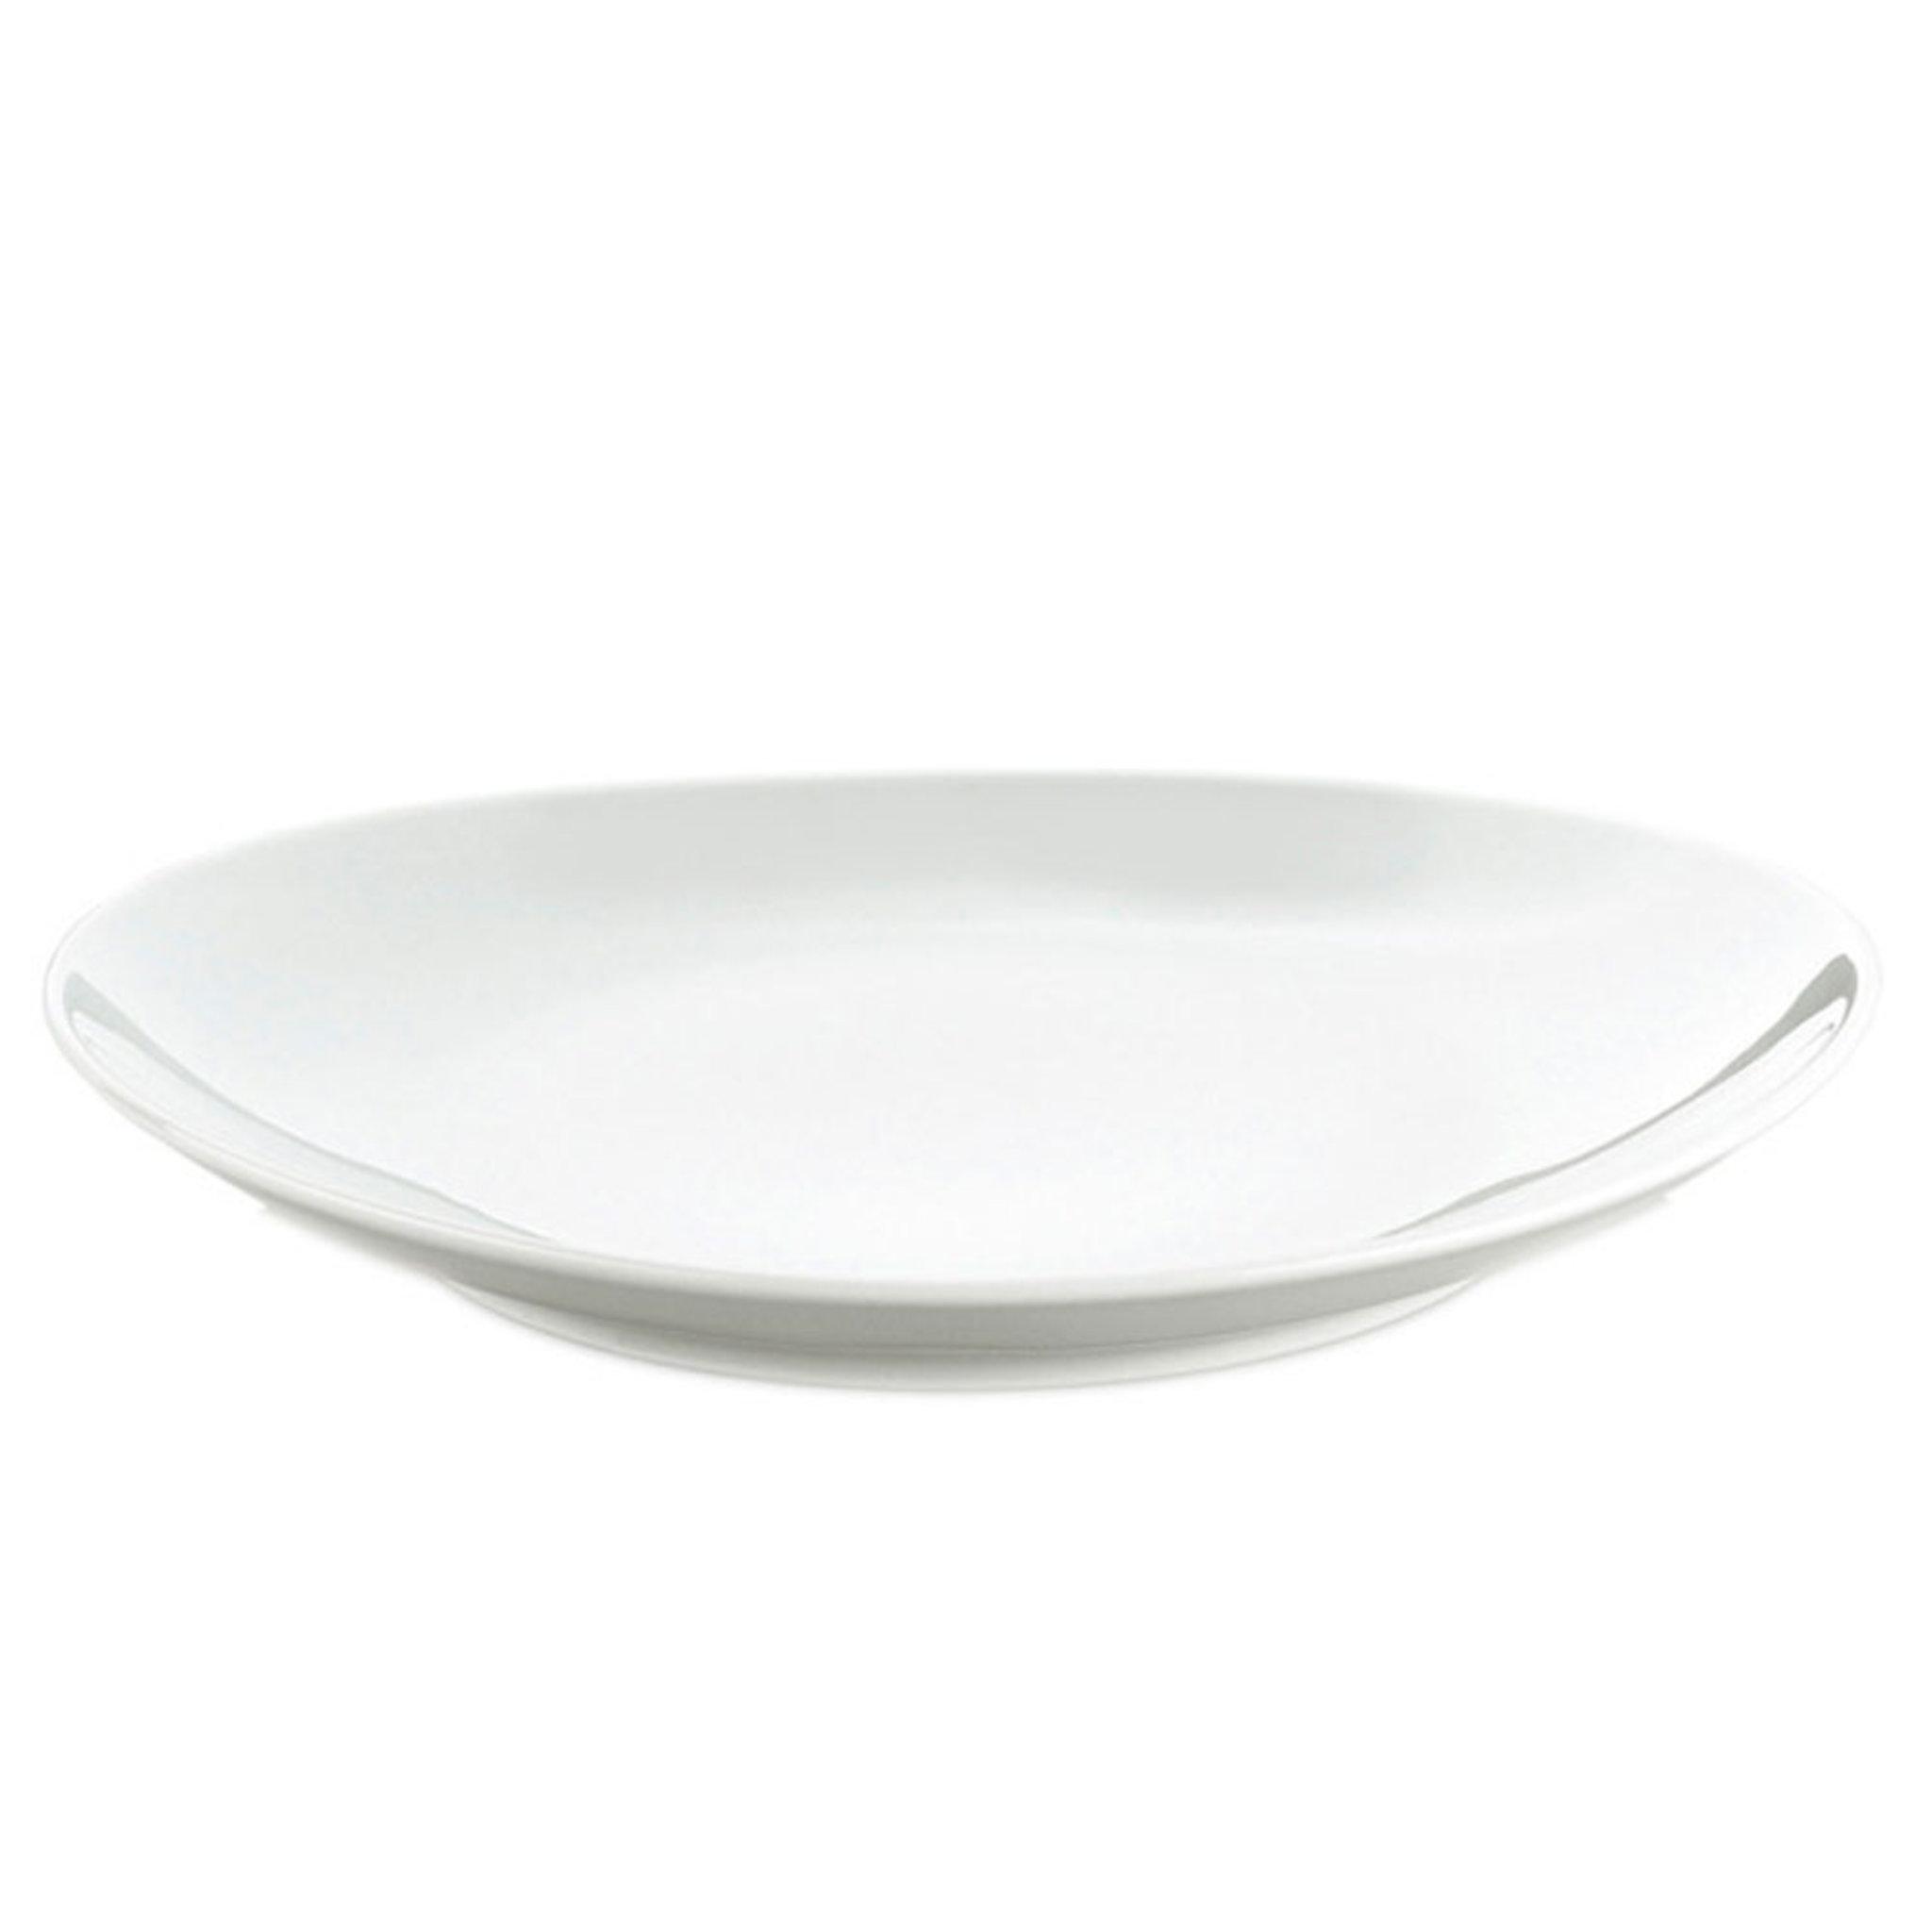 Steaktallrik oval 295 cm